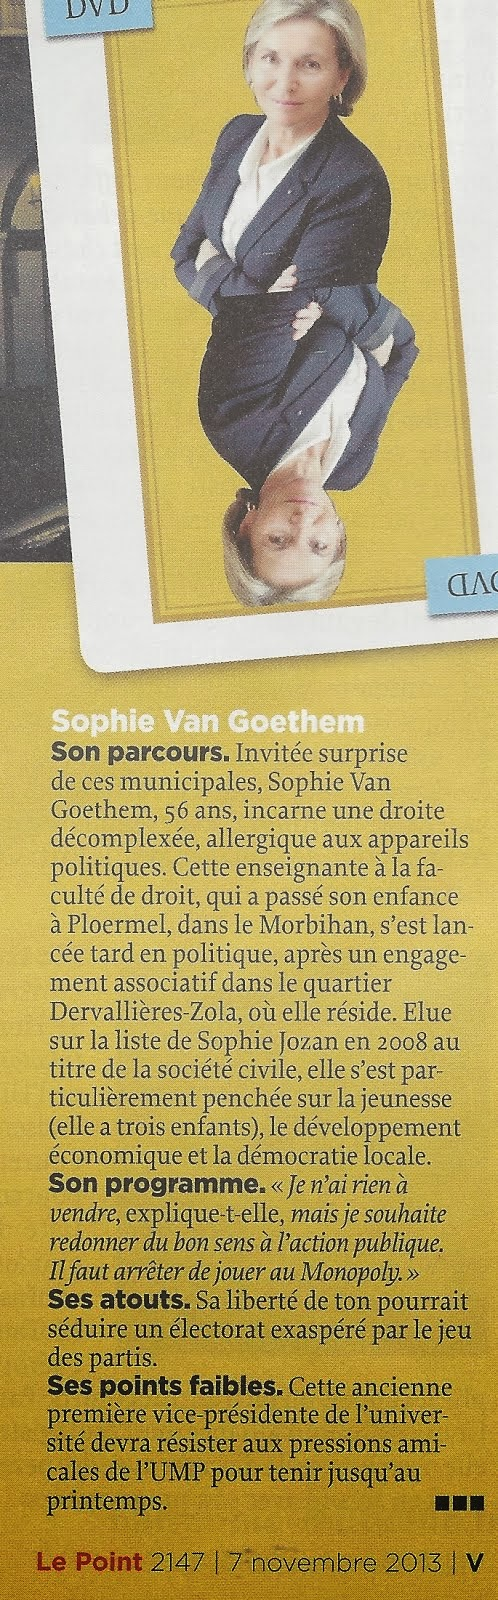 Le Point 7 11 2013